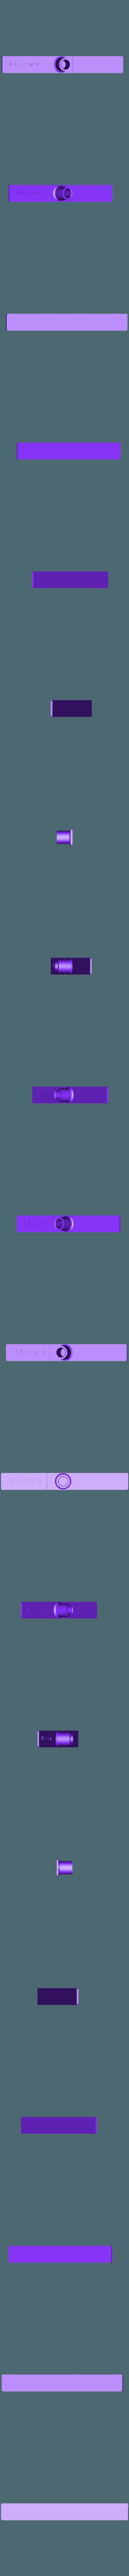 revibase.stl Download free STL file Tiny whoop straw gate • 3D printer template, jarp1977